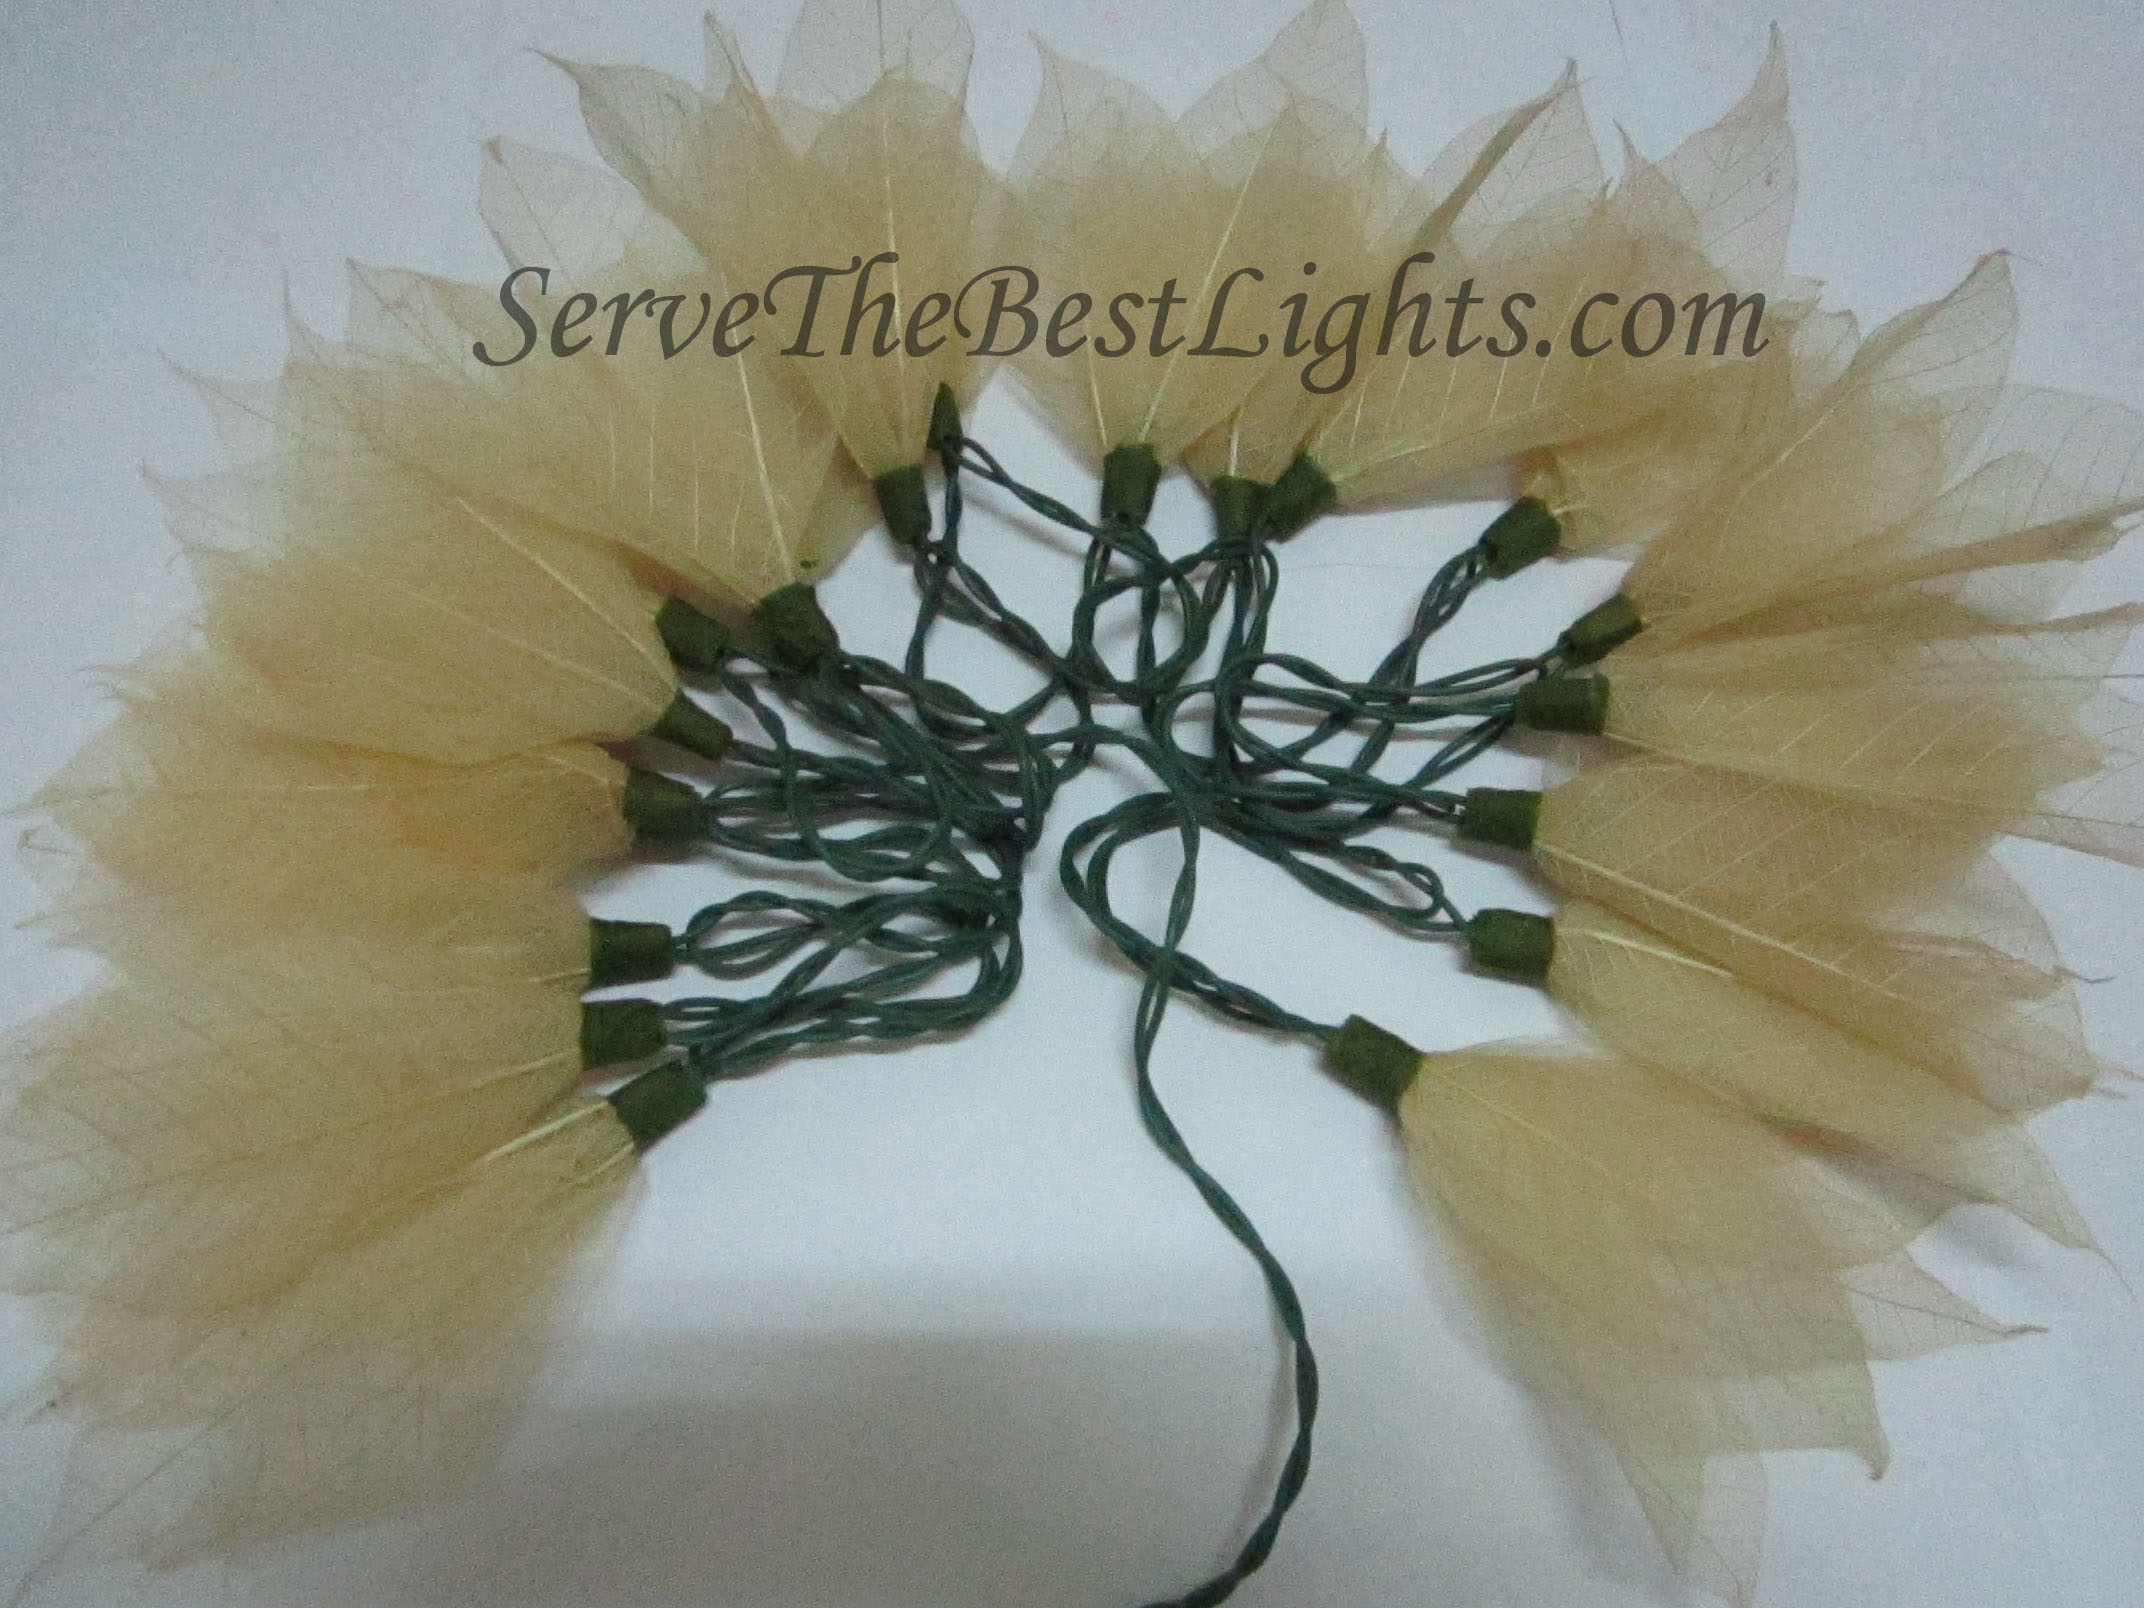 White Leaf Servethebestlights